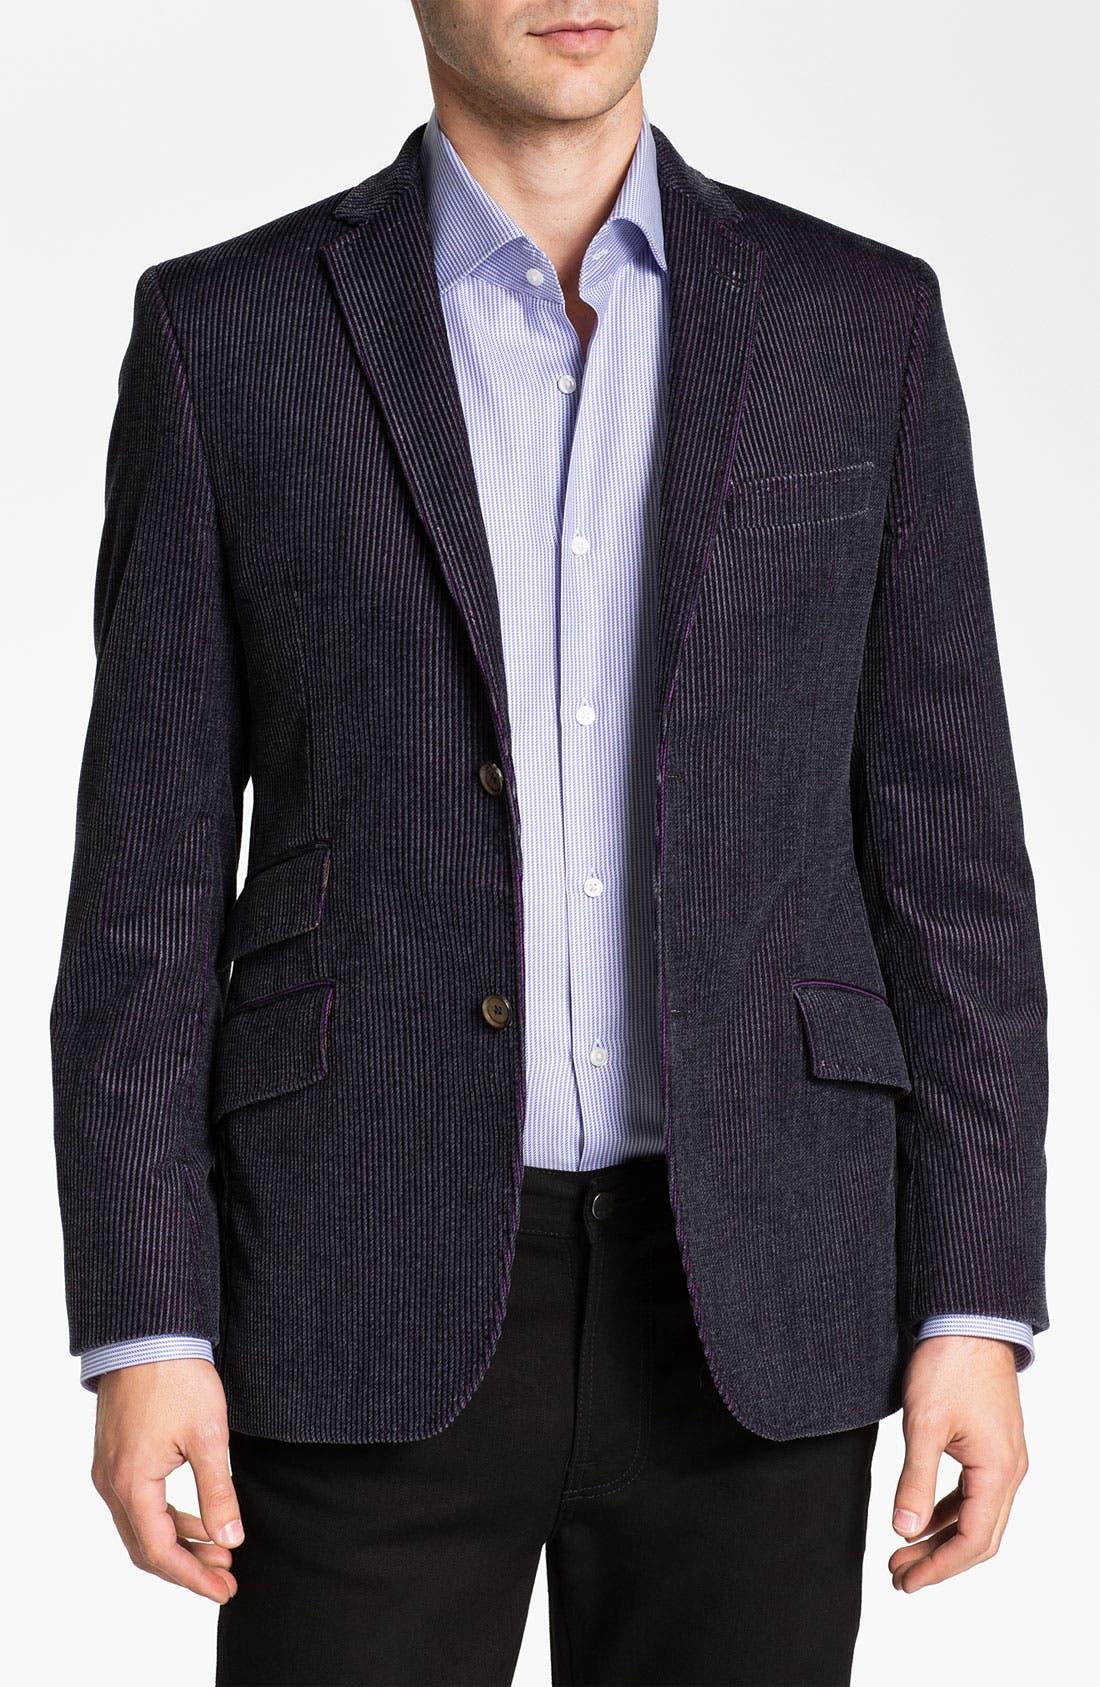 Alternate Image 1 Selected - Ted Baker London 'Global' Trim Fit Corduroy Sportcoat